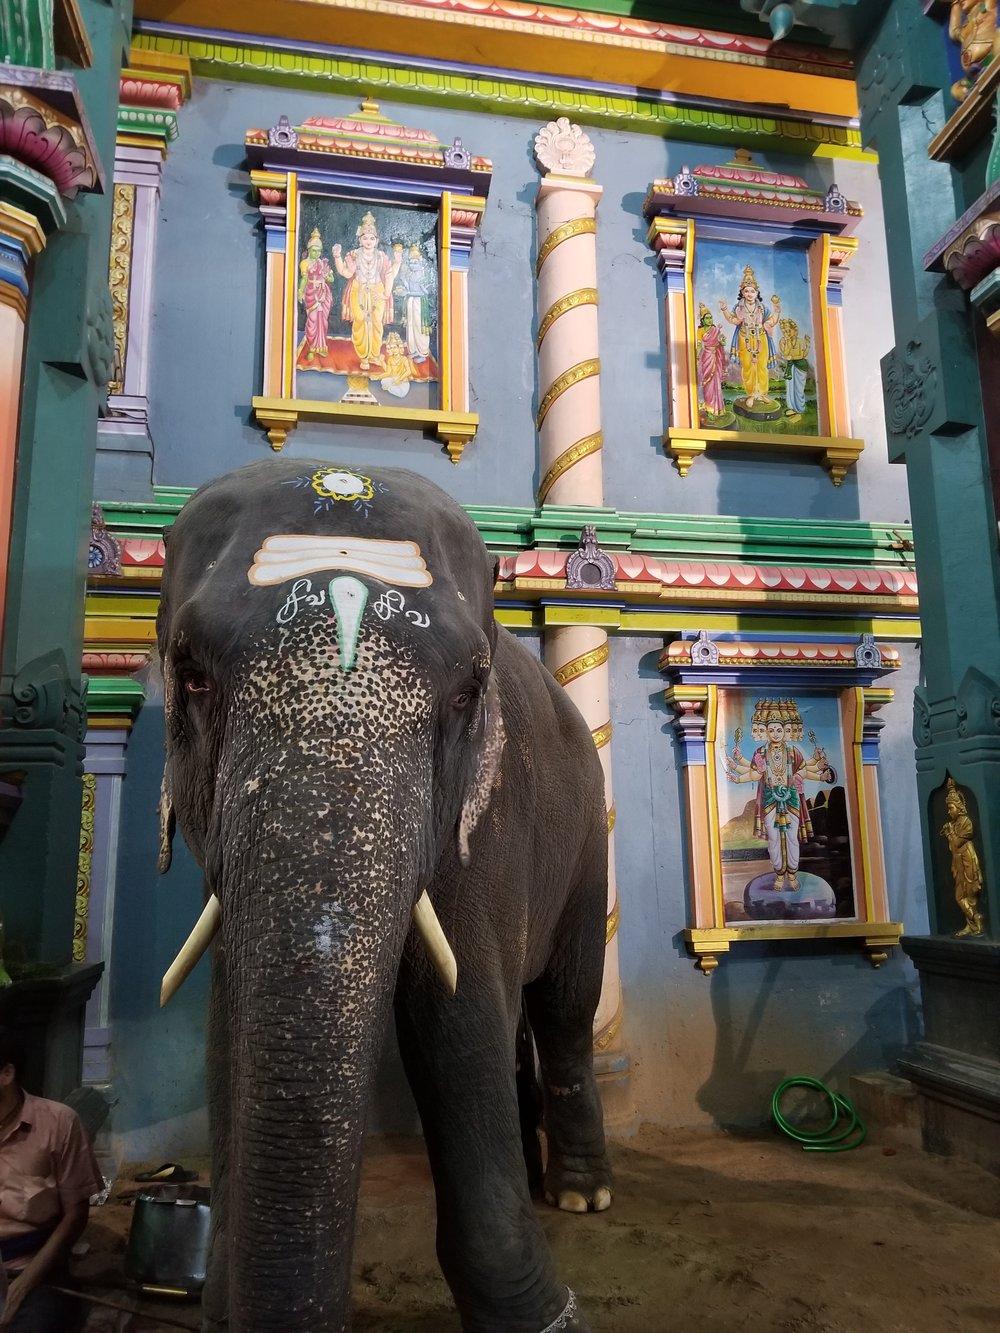 Lakshmi @ Manakula Vinayagar Temple dedicated to Ganesha